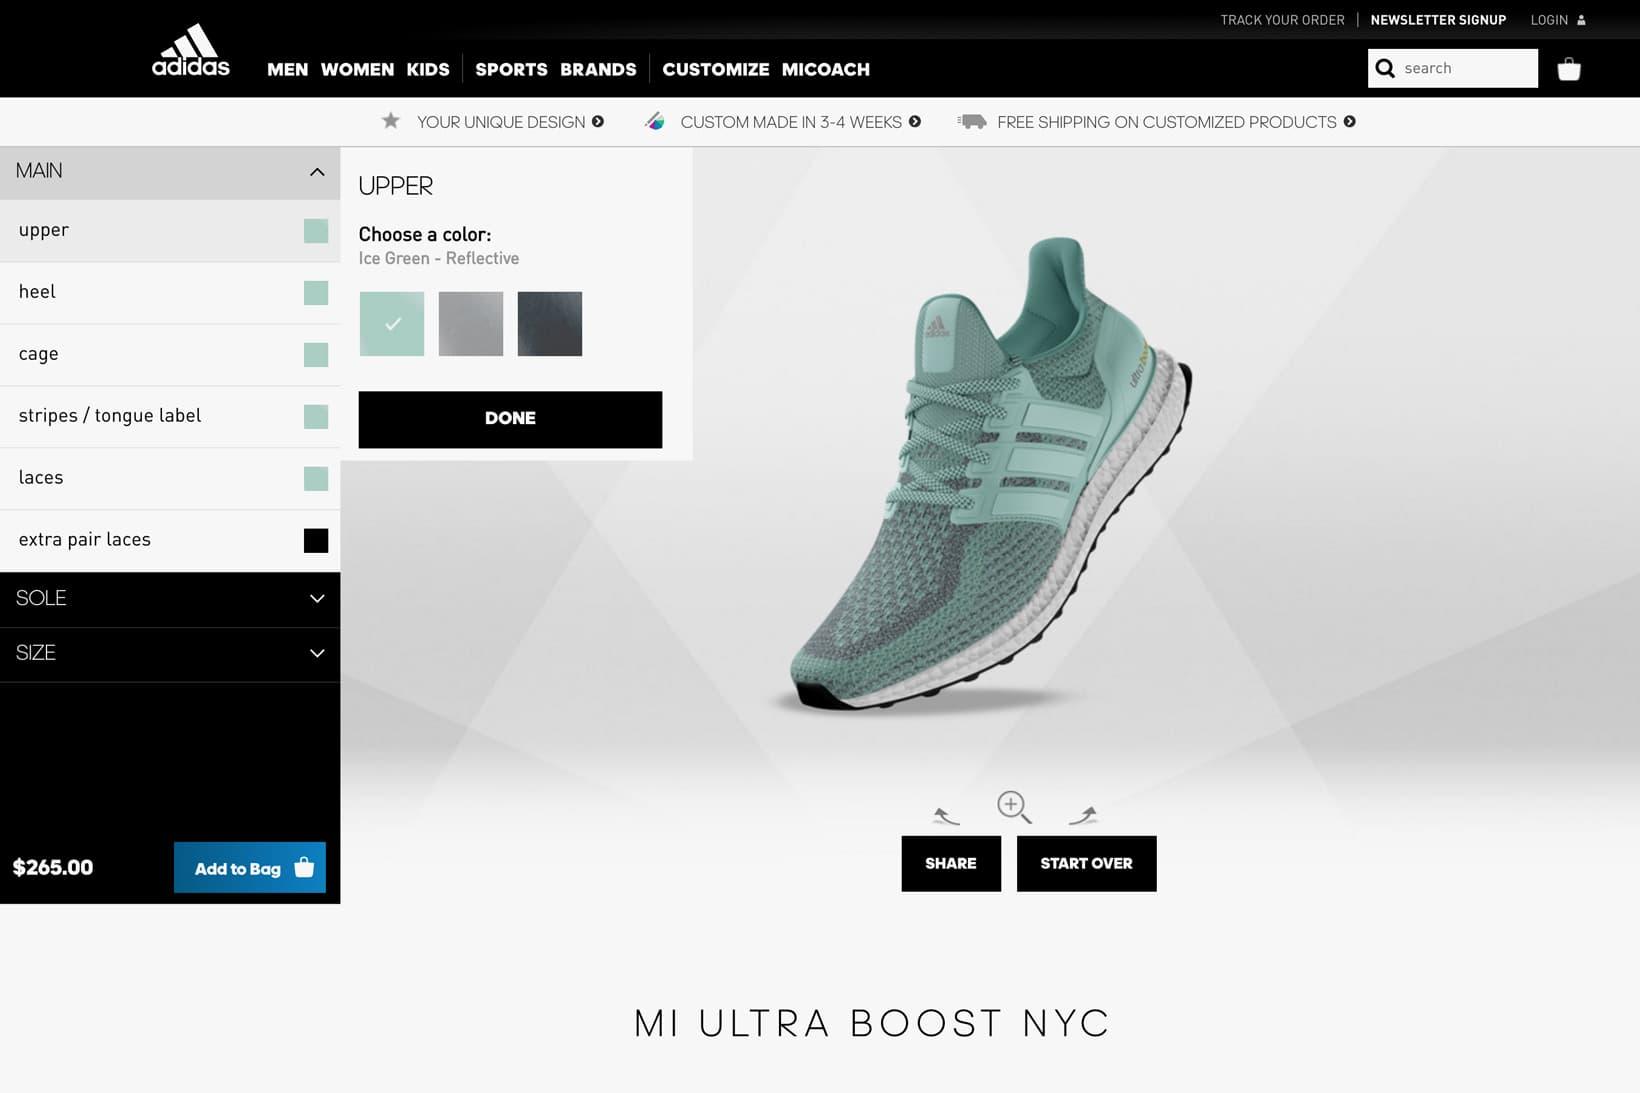 The adidas UltraBOOST Finally Gets mi adidas Customization Service